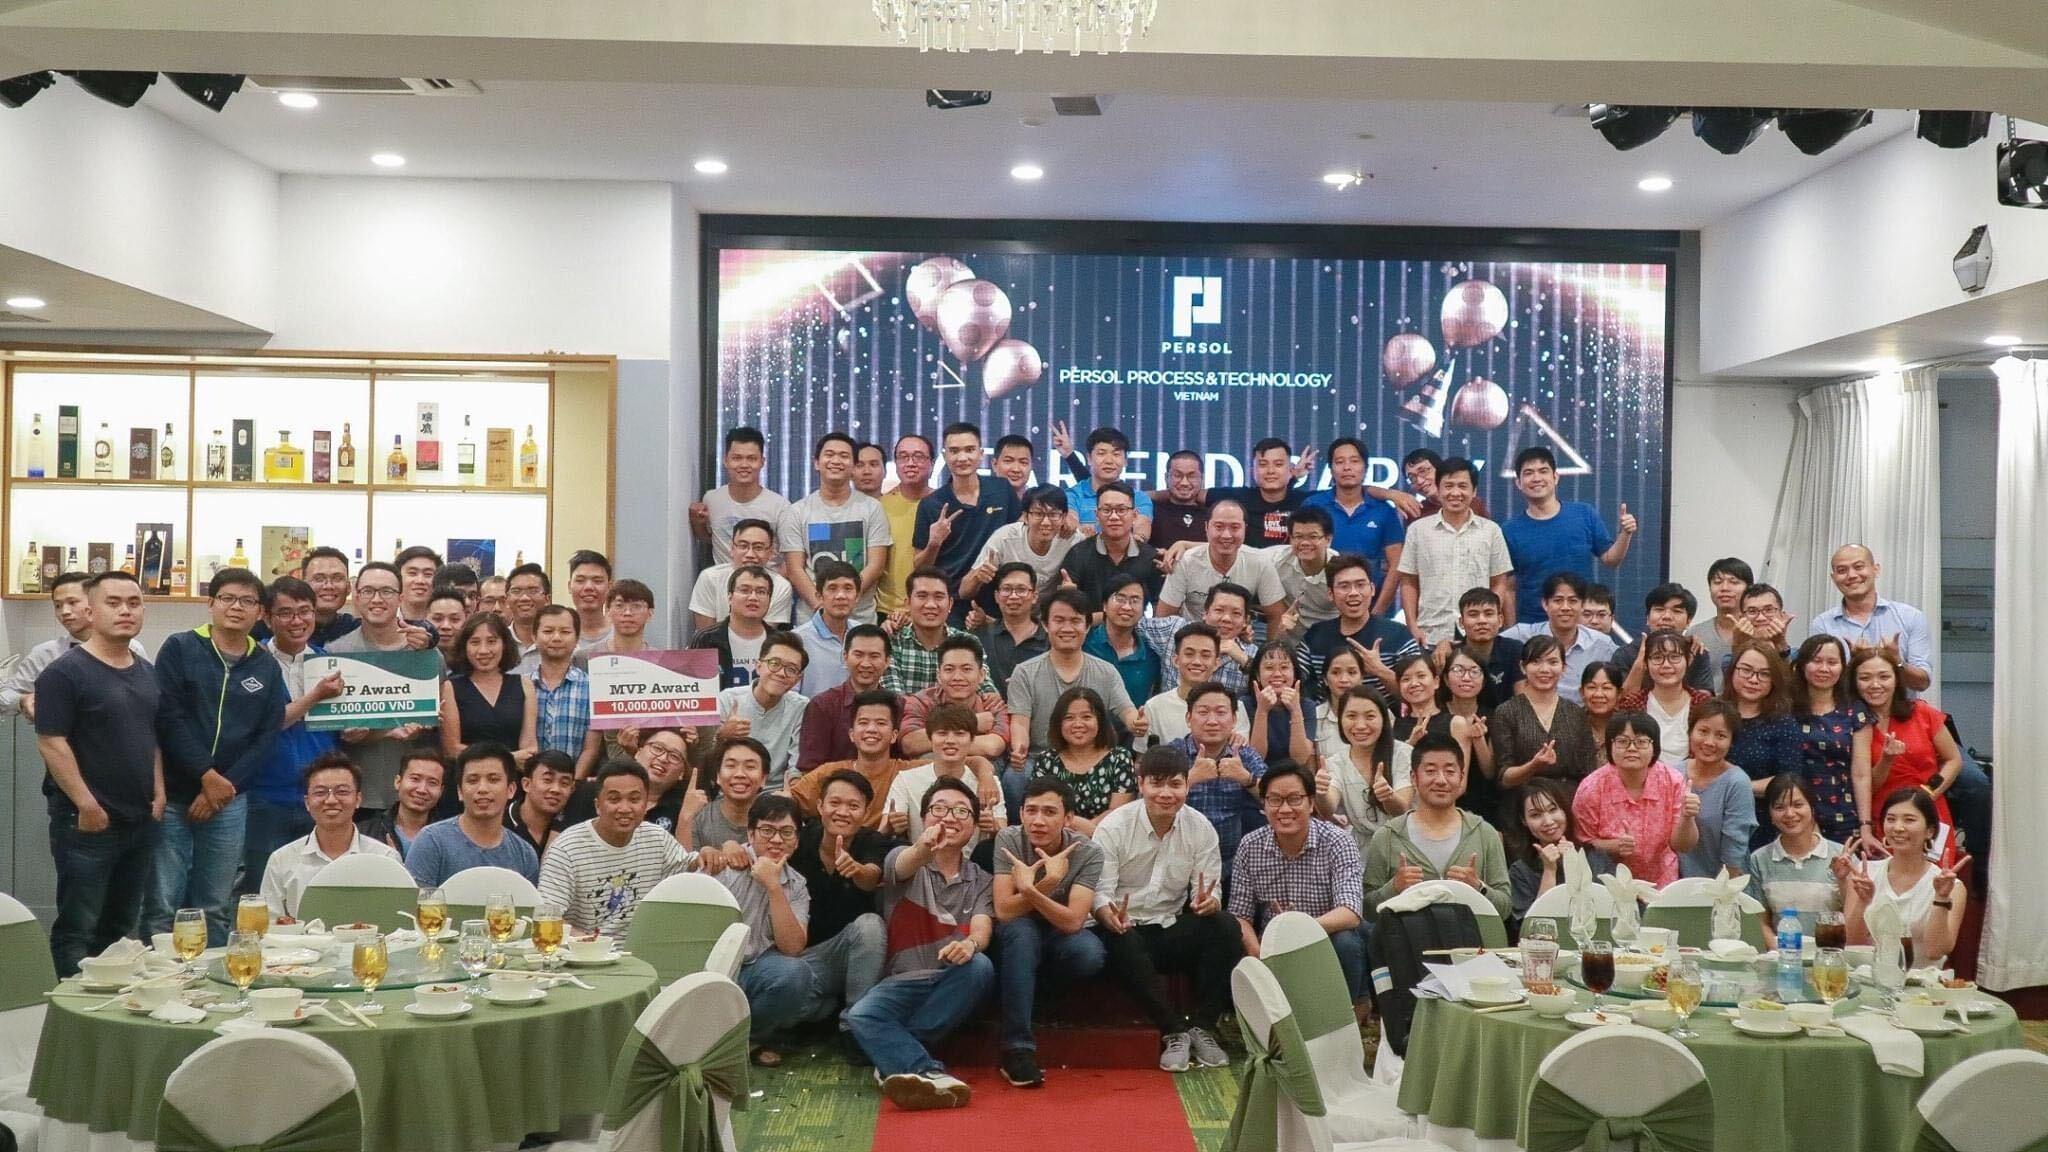 Jobs at Persol Process & Technology Vietnam Co., Ltd.